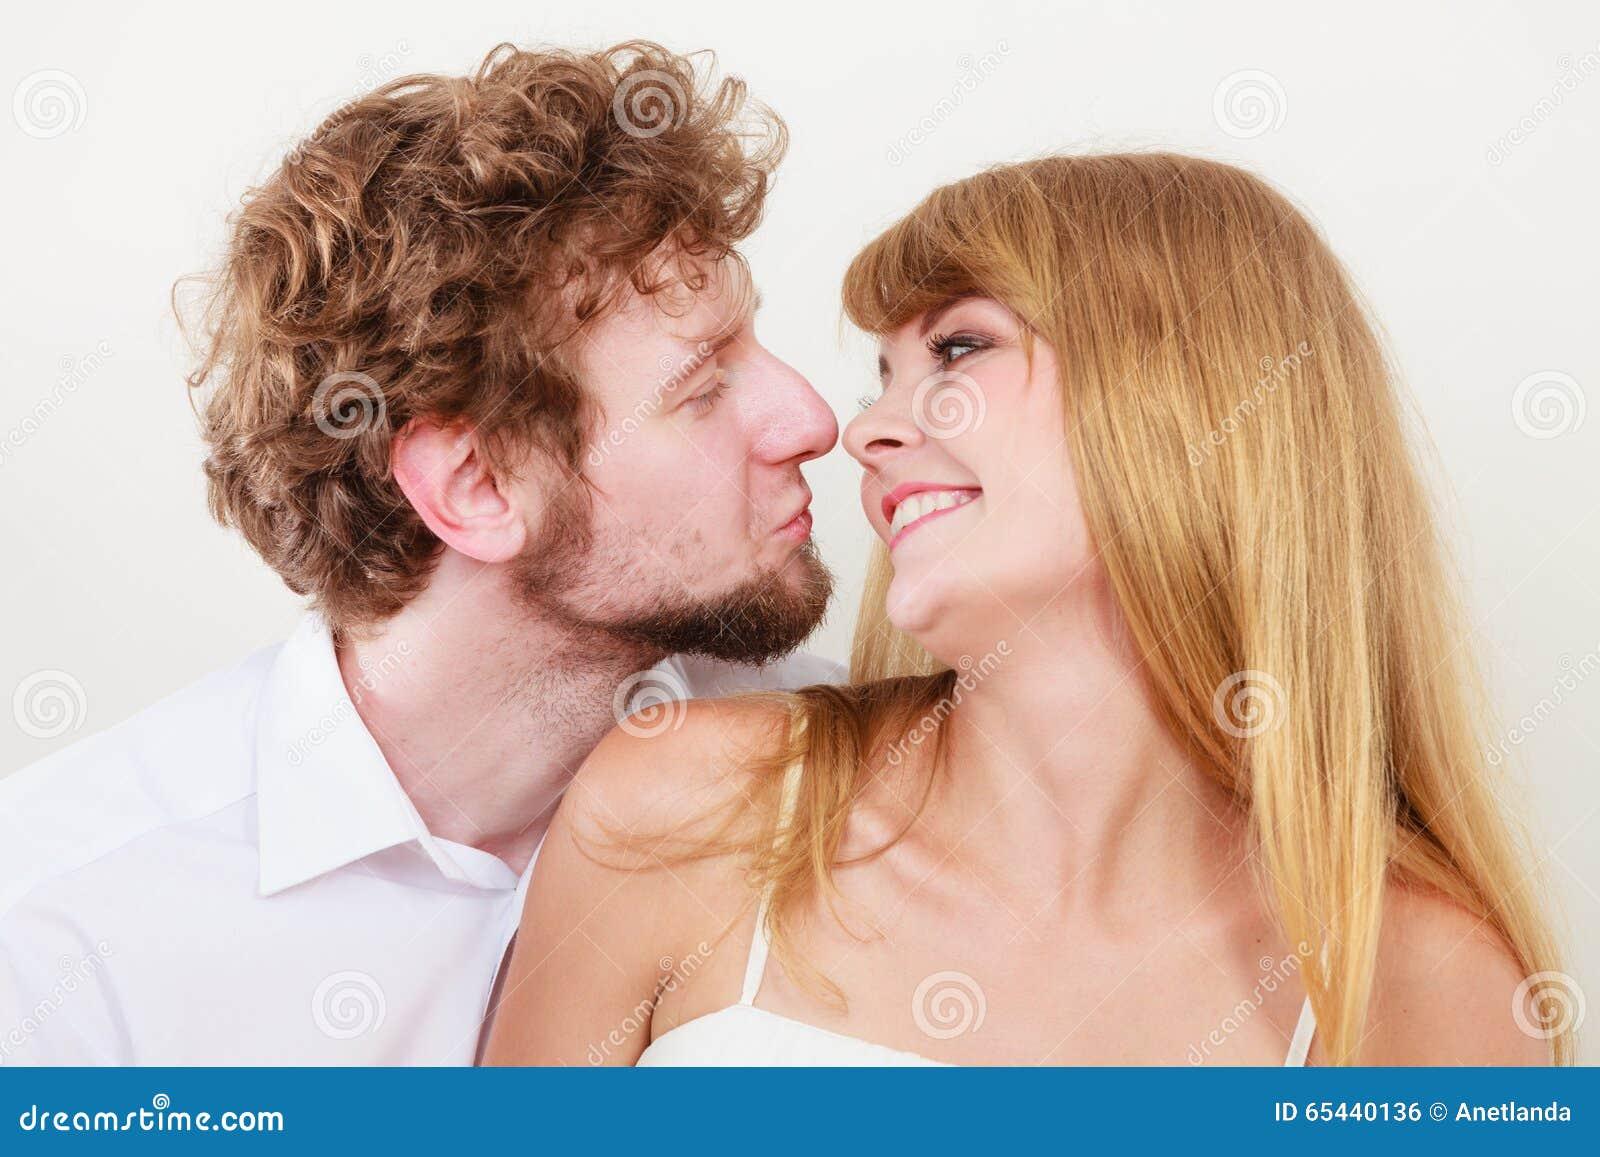 Liv Tyler dating Joaquin Phoenix